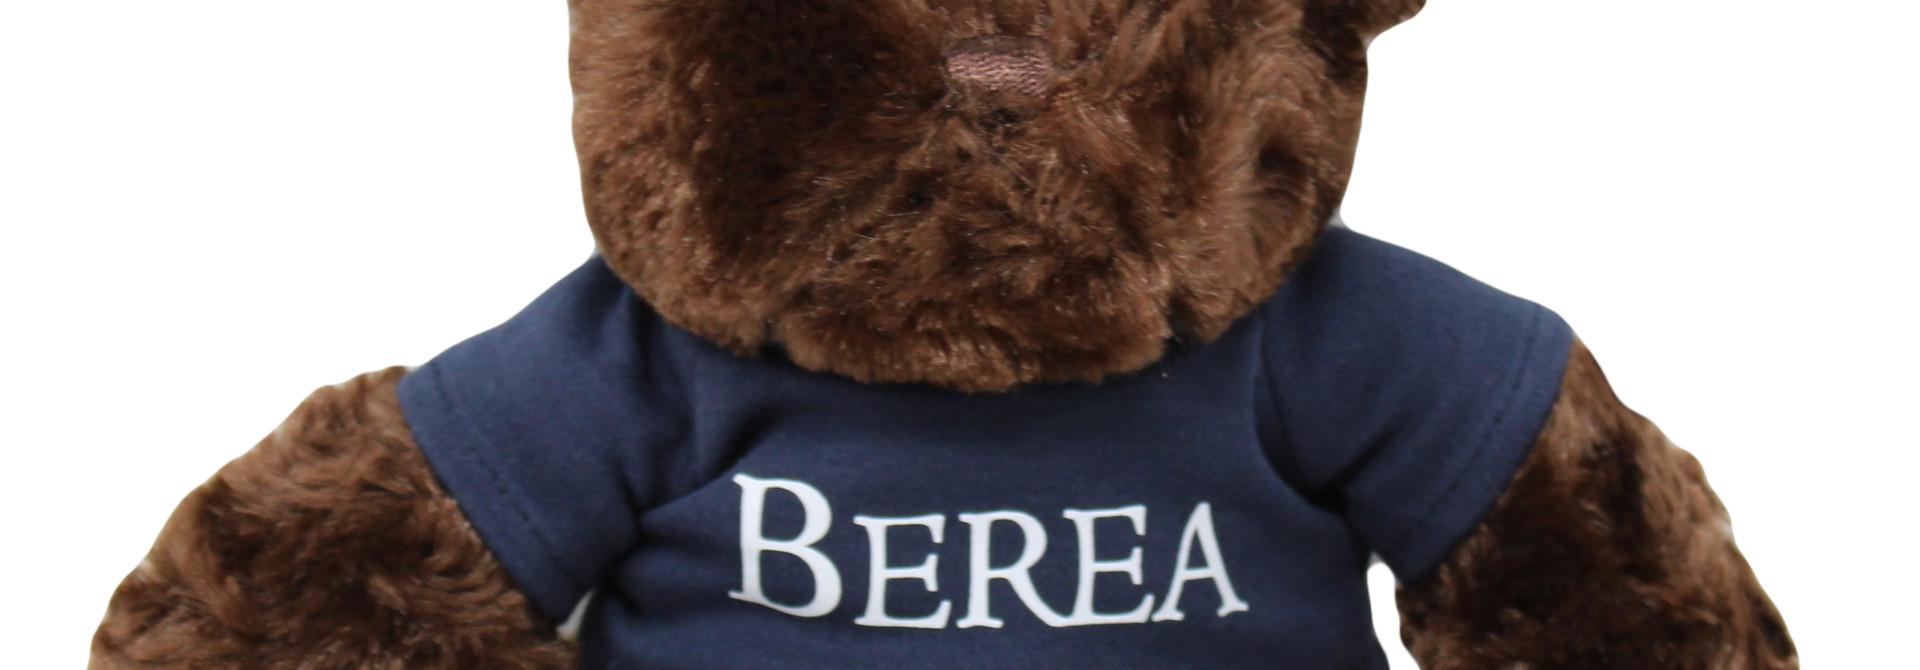 Traditional Bear Berea College T-Shirt